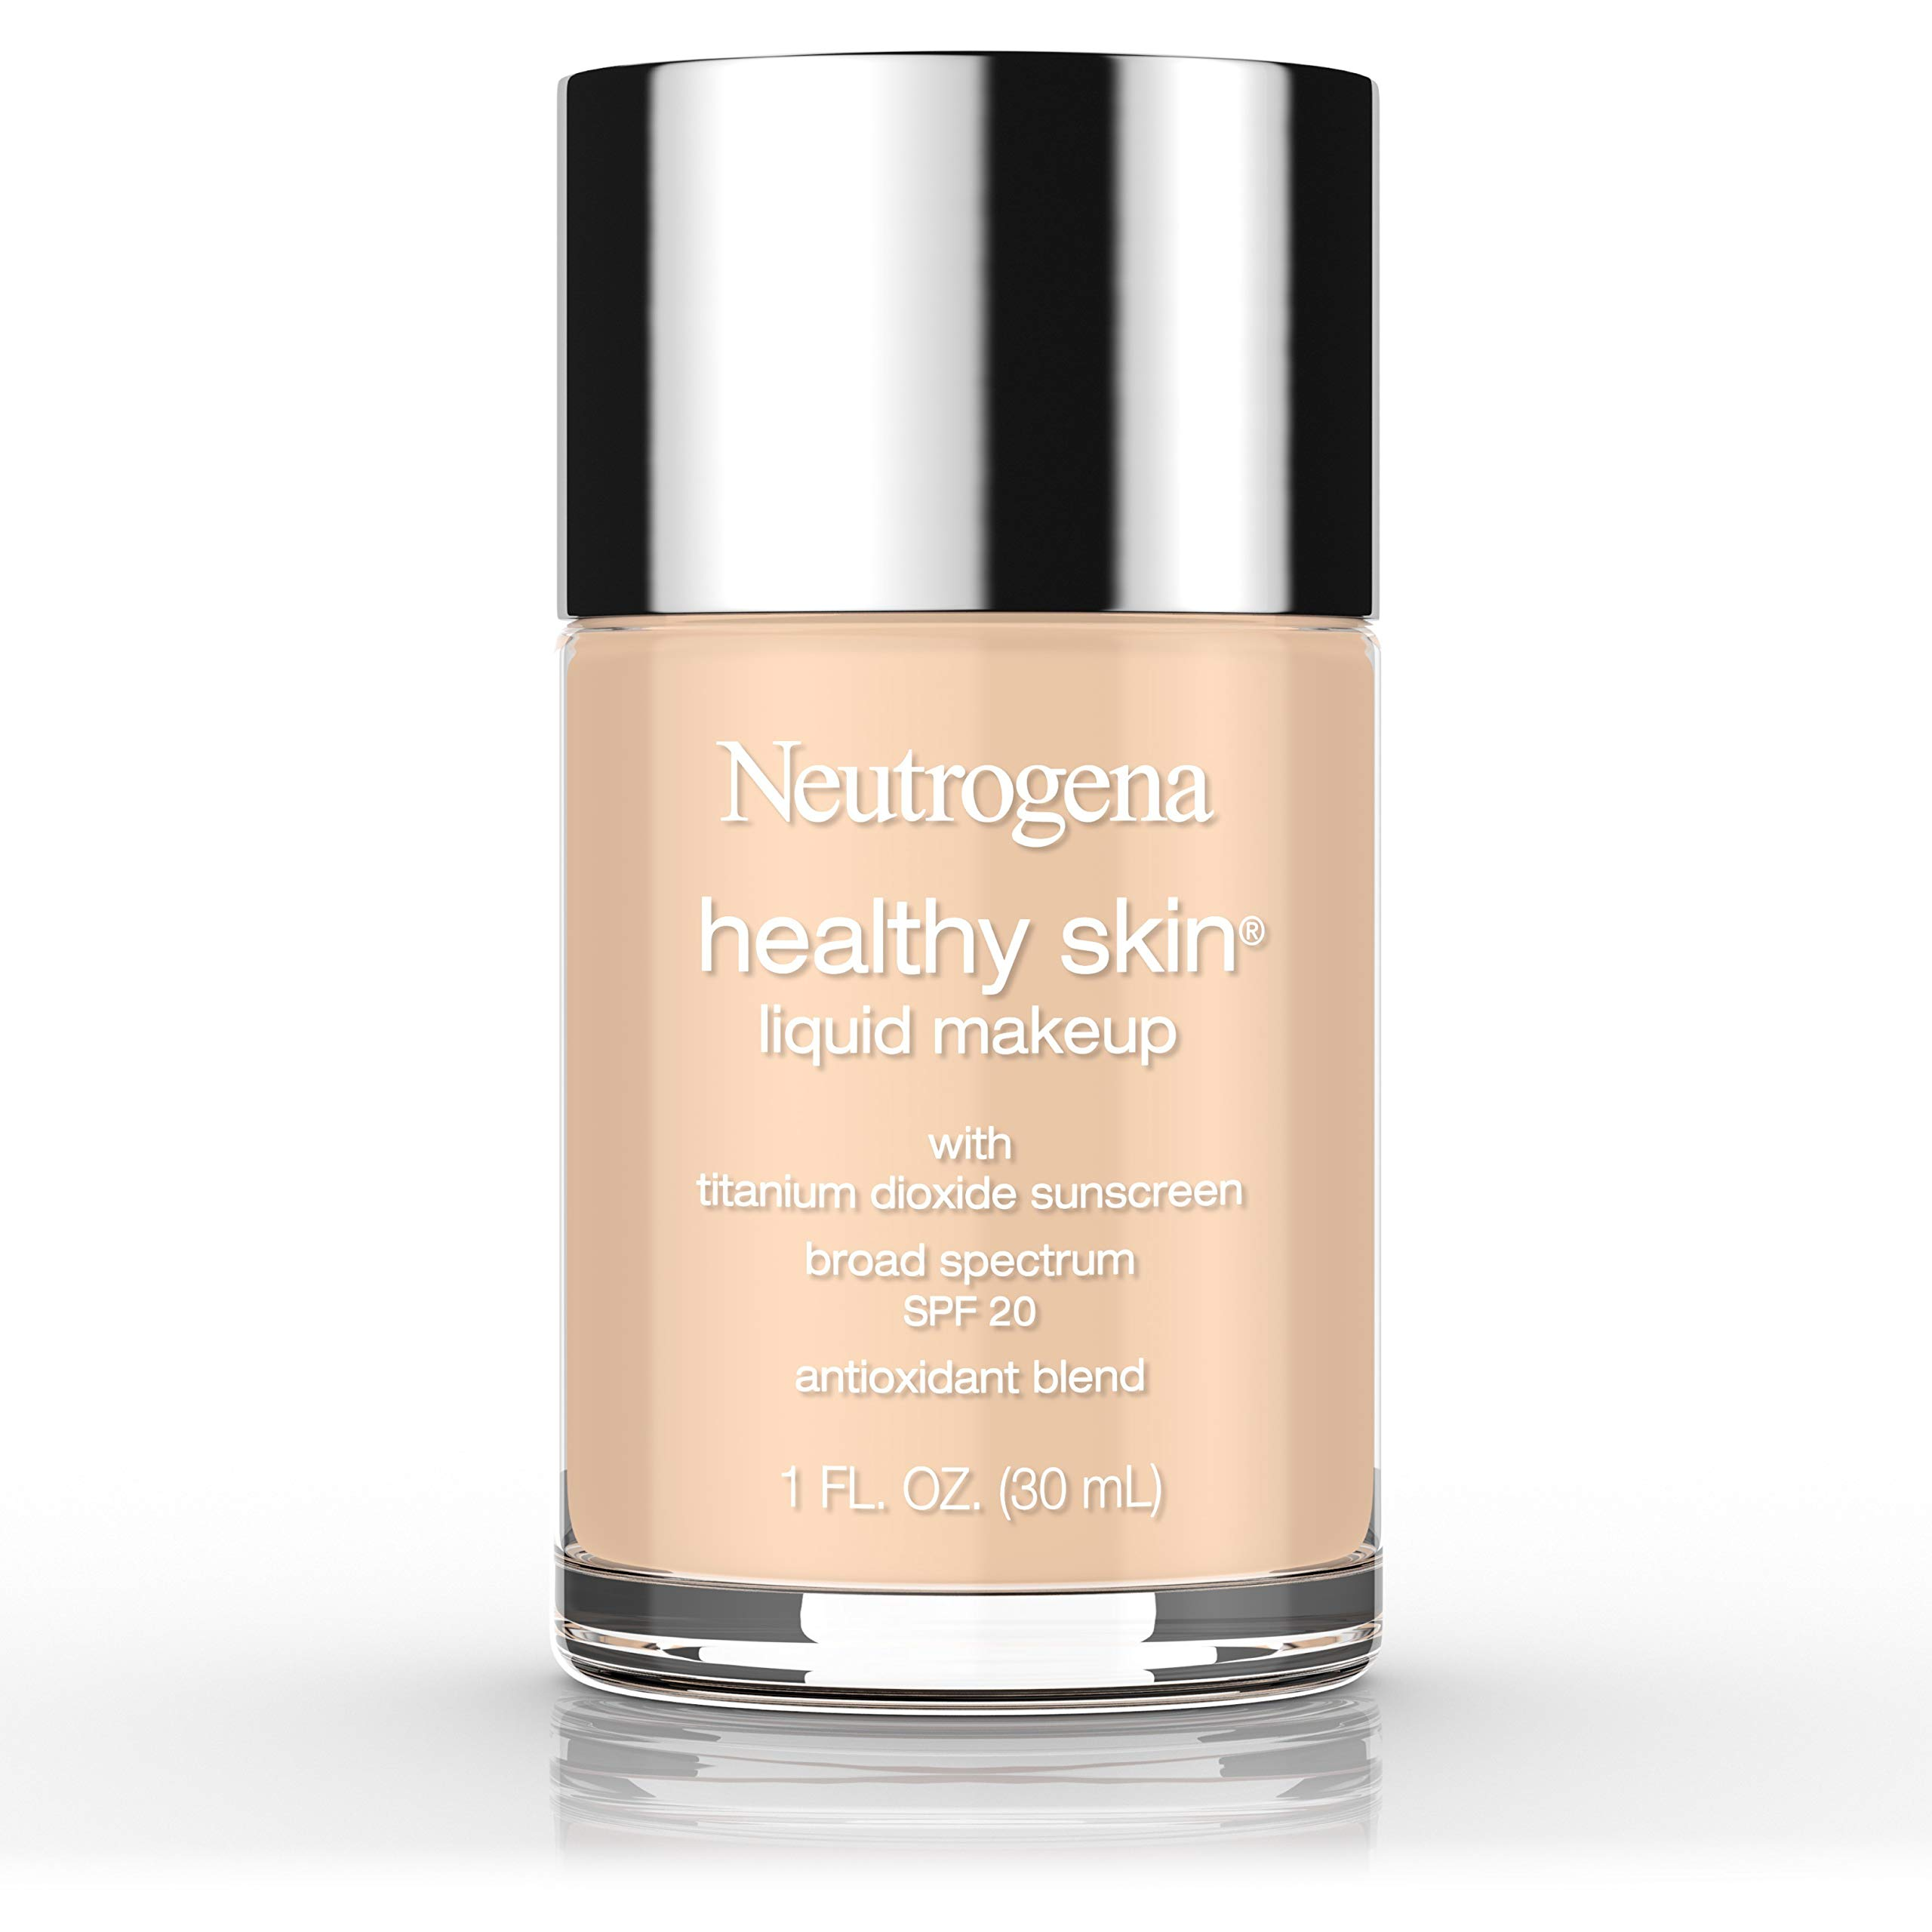 Neutrogena Healthy Skin Liquid Makeup Foundation, Broad Spectrum SPF 20 Sunscreen, Lightweight & Flawless Coverage Foundation with Antioxidant Vitamin E & Feverfew, Natural Beige, 1 fl. oz